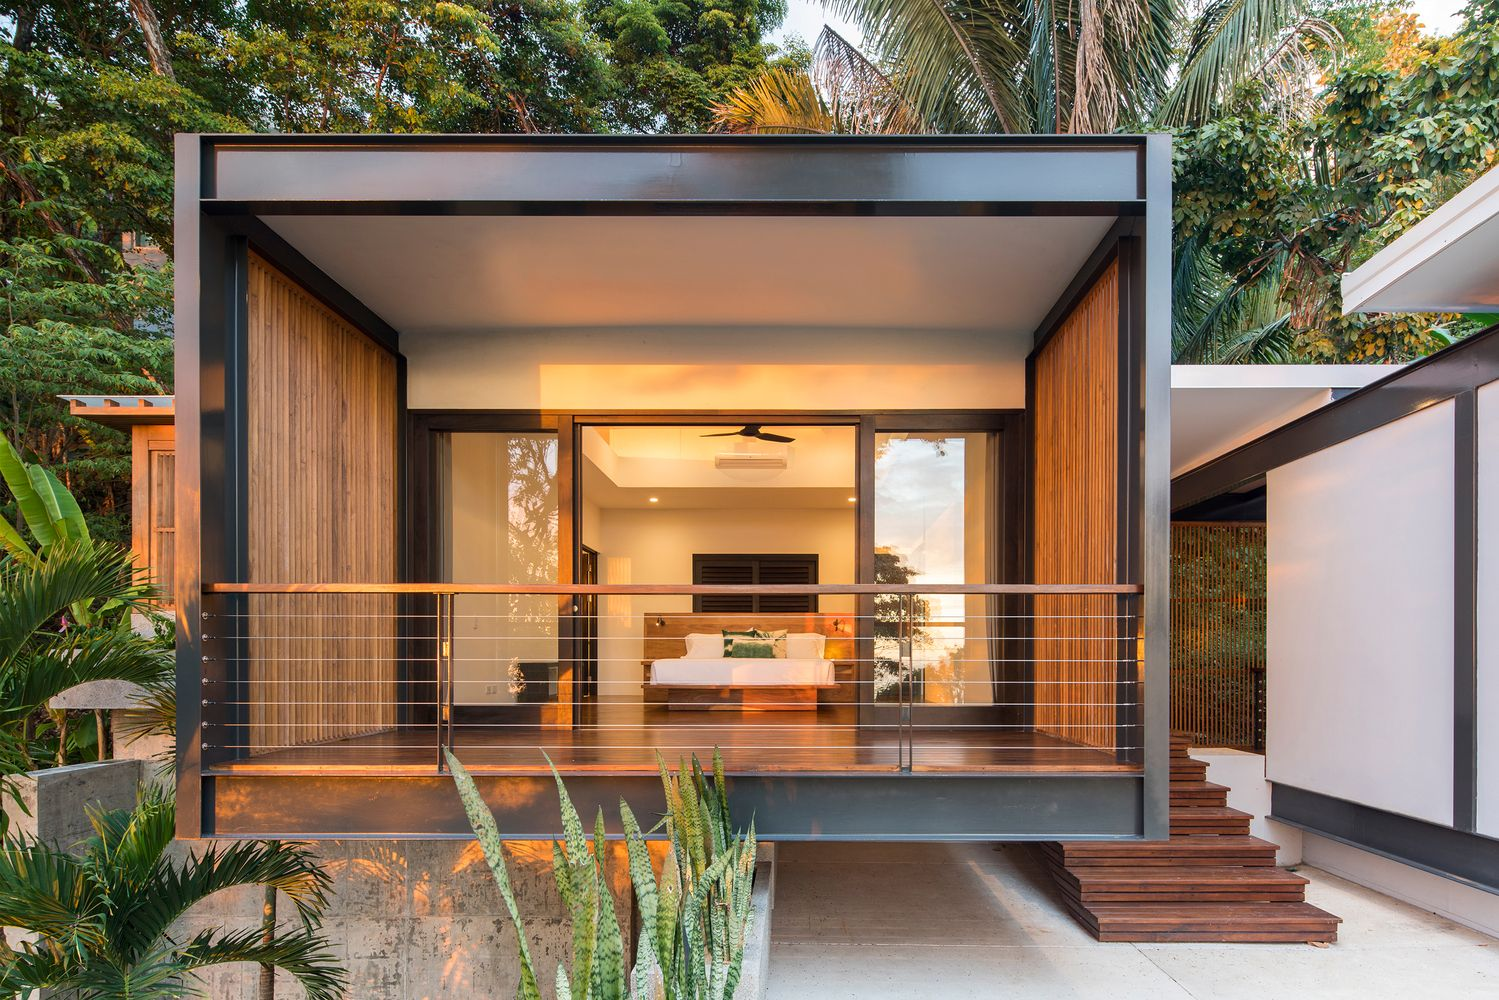 Gallery of joya villas studio saxe 2 detalles for Decoracion de casas de playa modernas